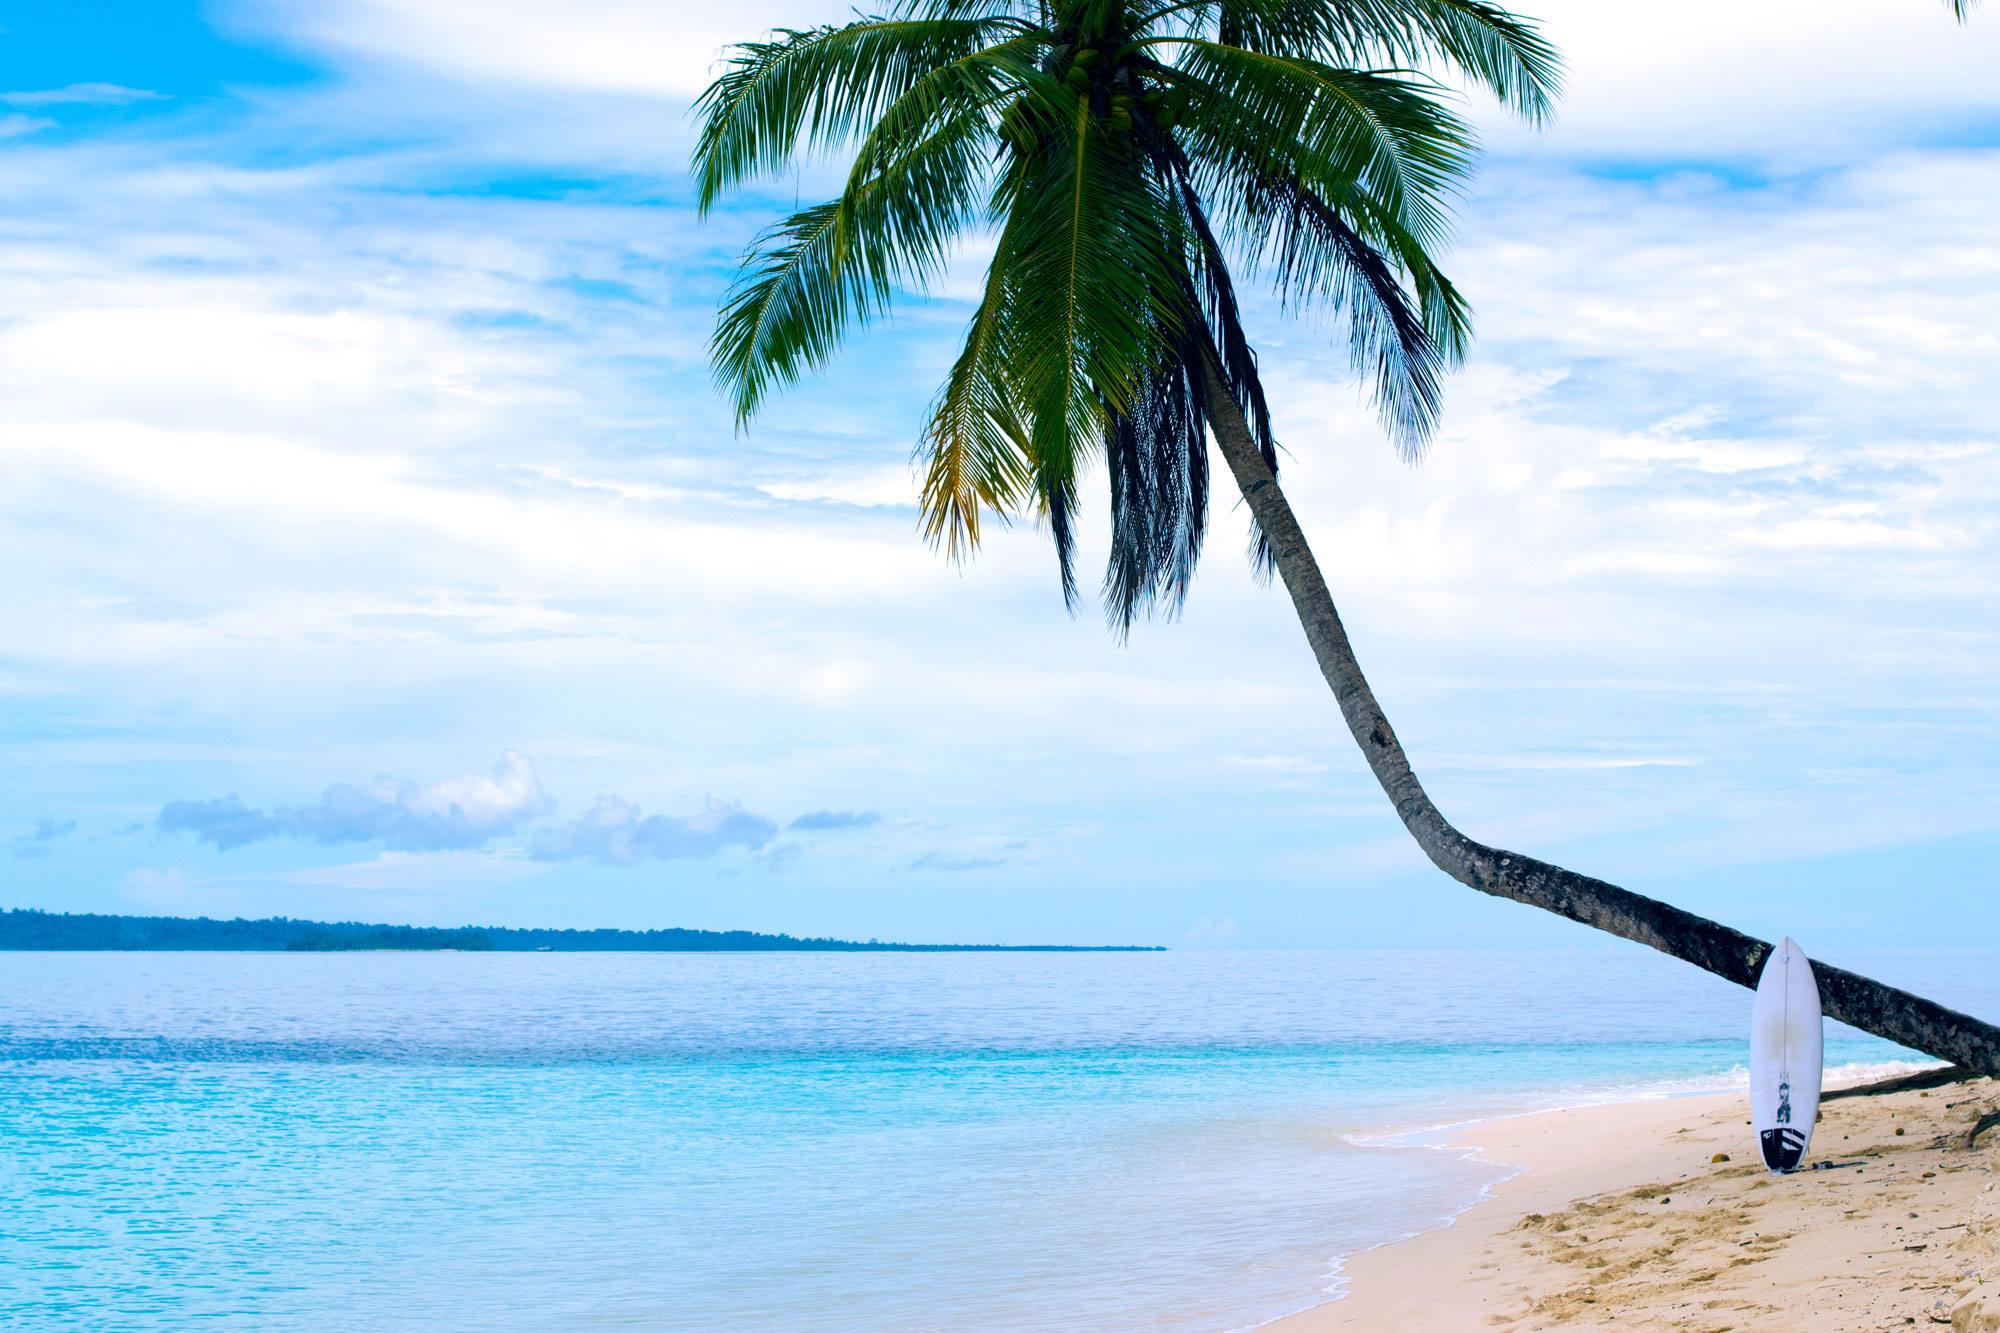 The Big Fish - Wave park Mentawai Islands